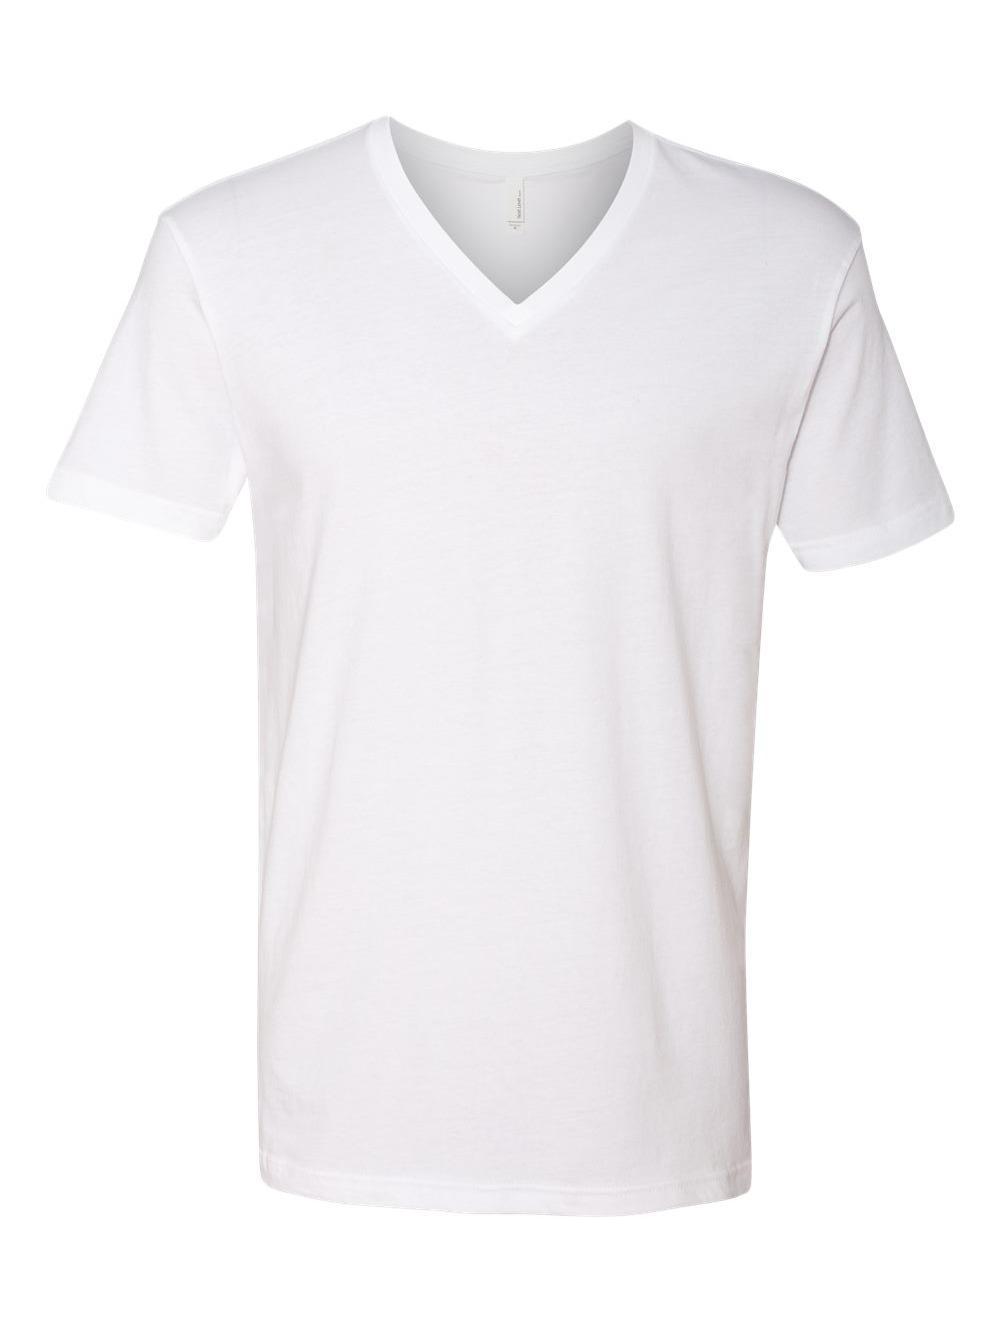 Next-Level-Premium-Short-Sleeve-V-3200 thumbnail 42